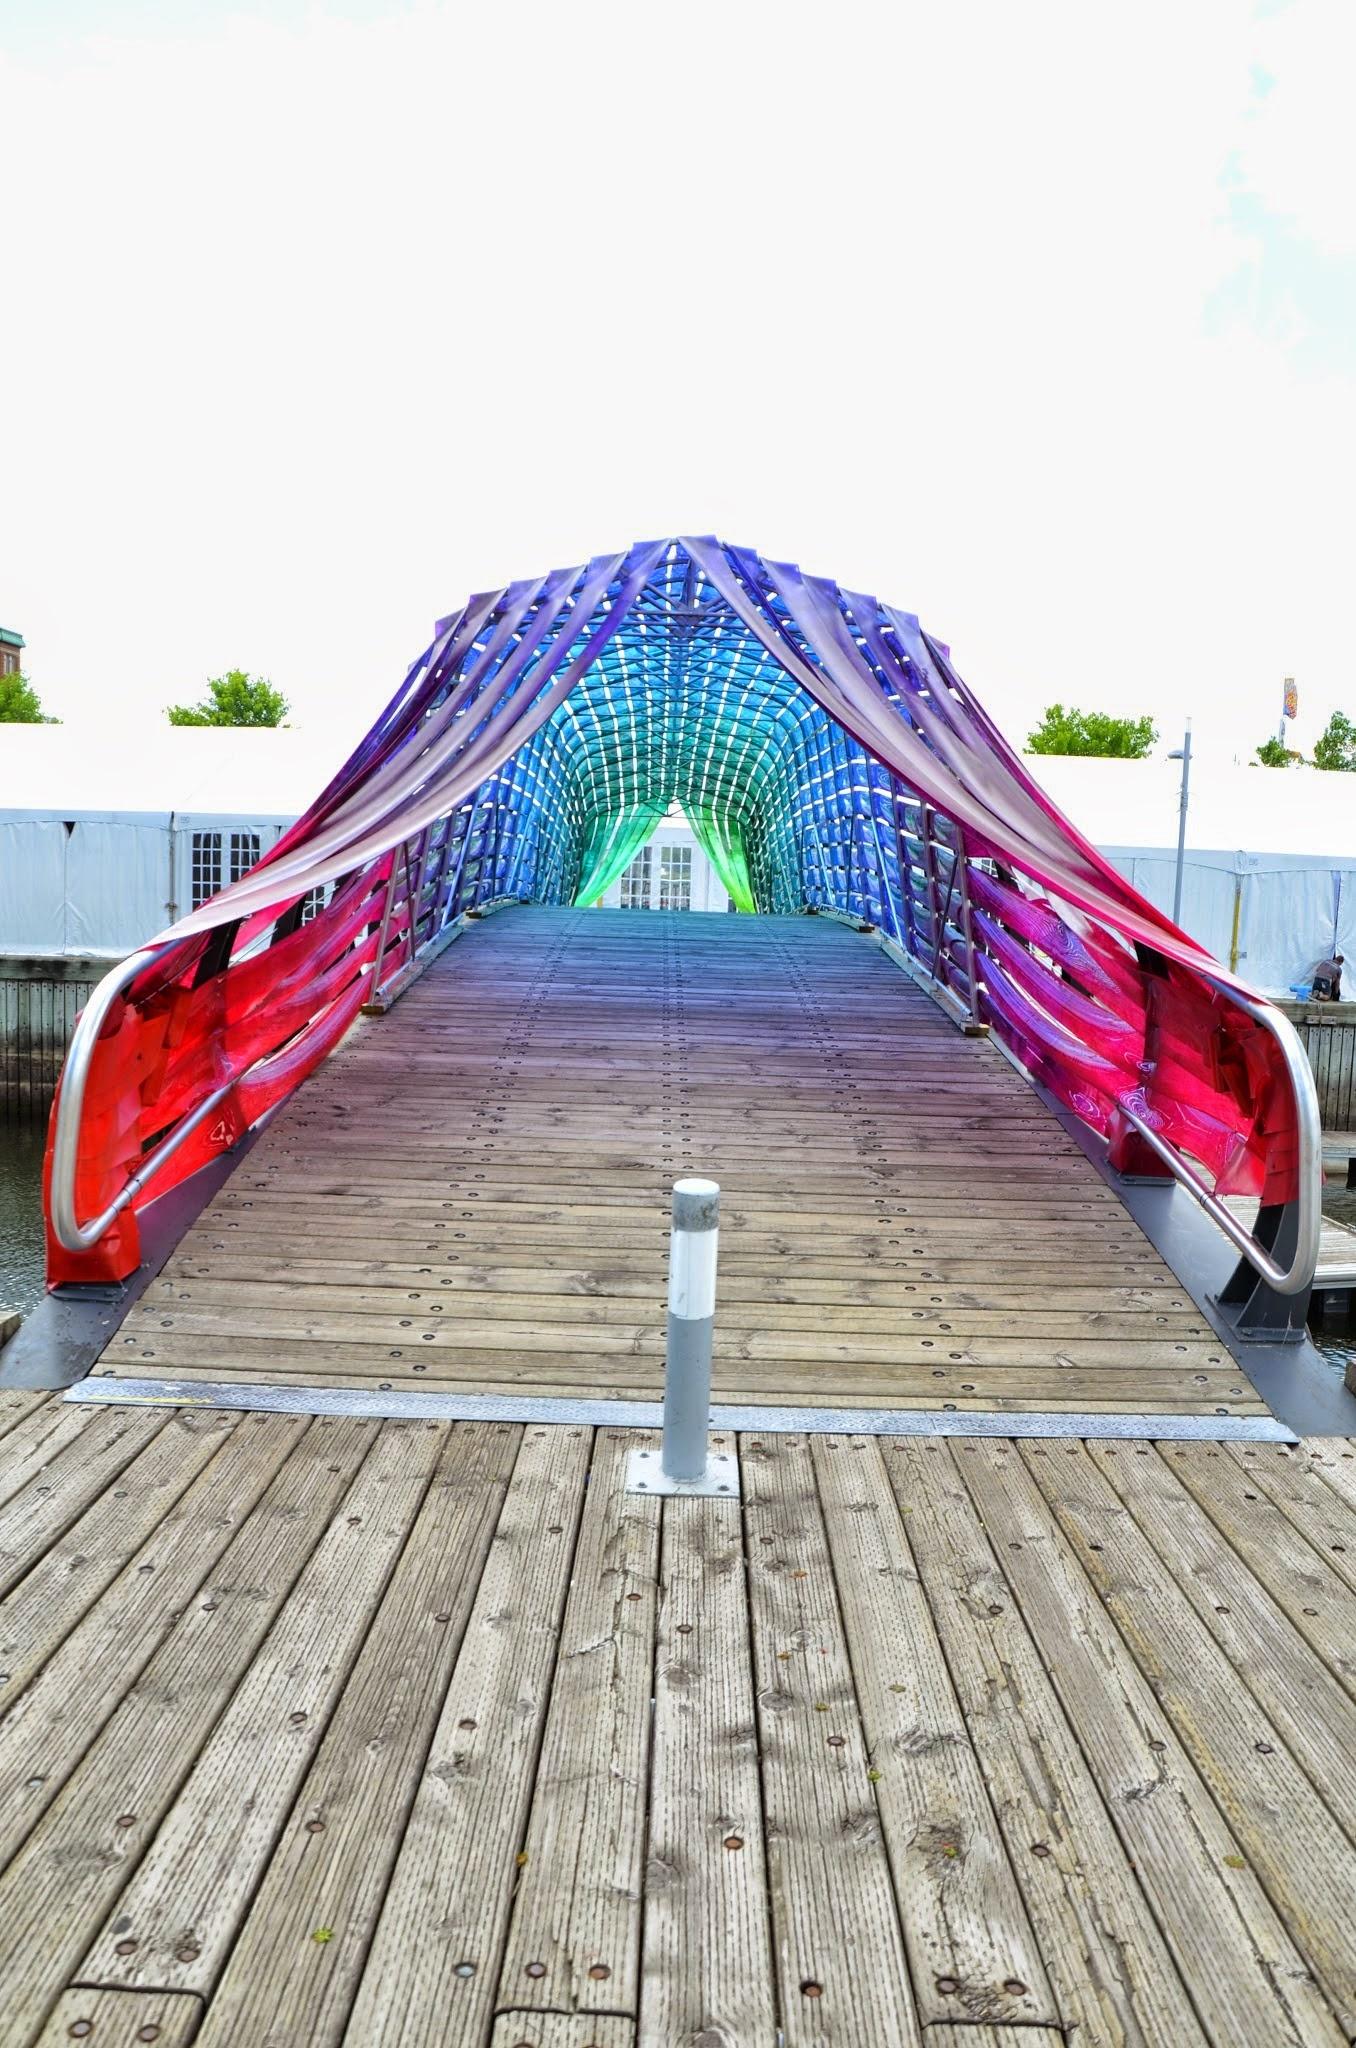 The secret of the fine art bridge by real.michaud.5036